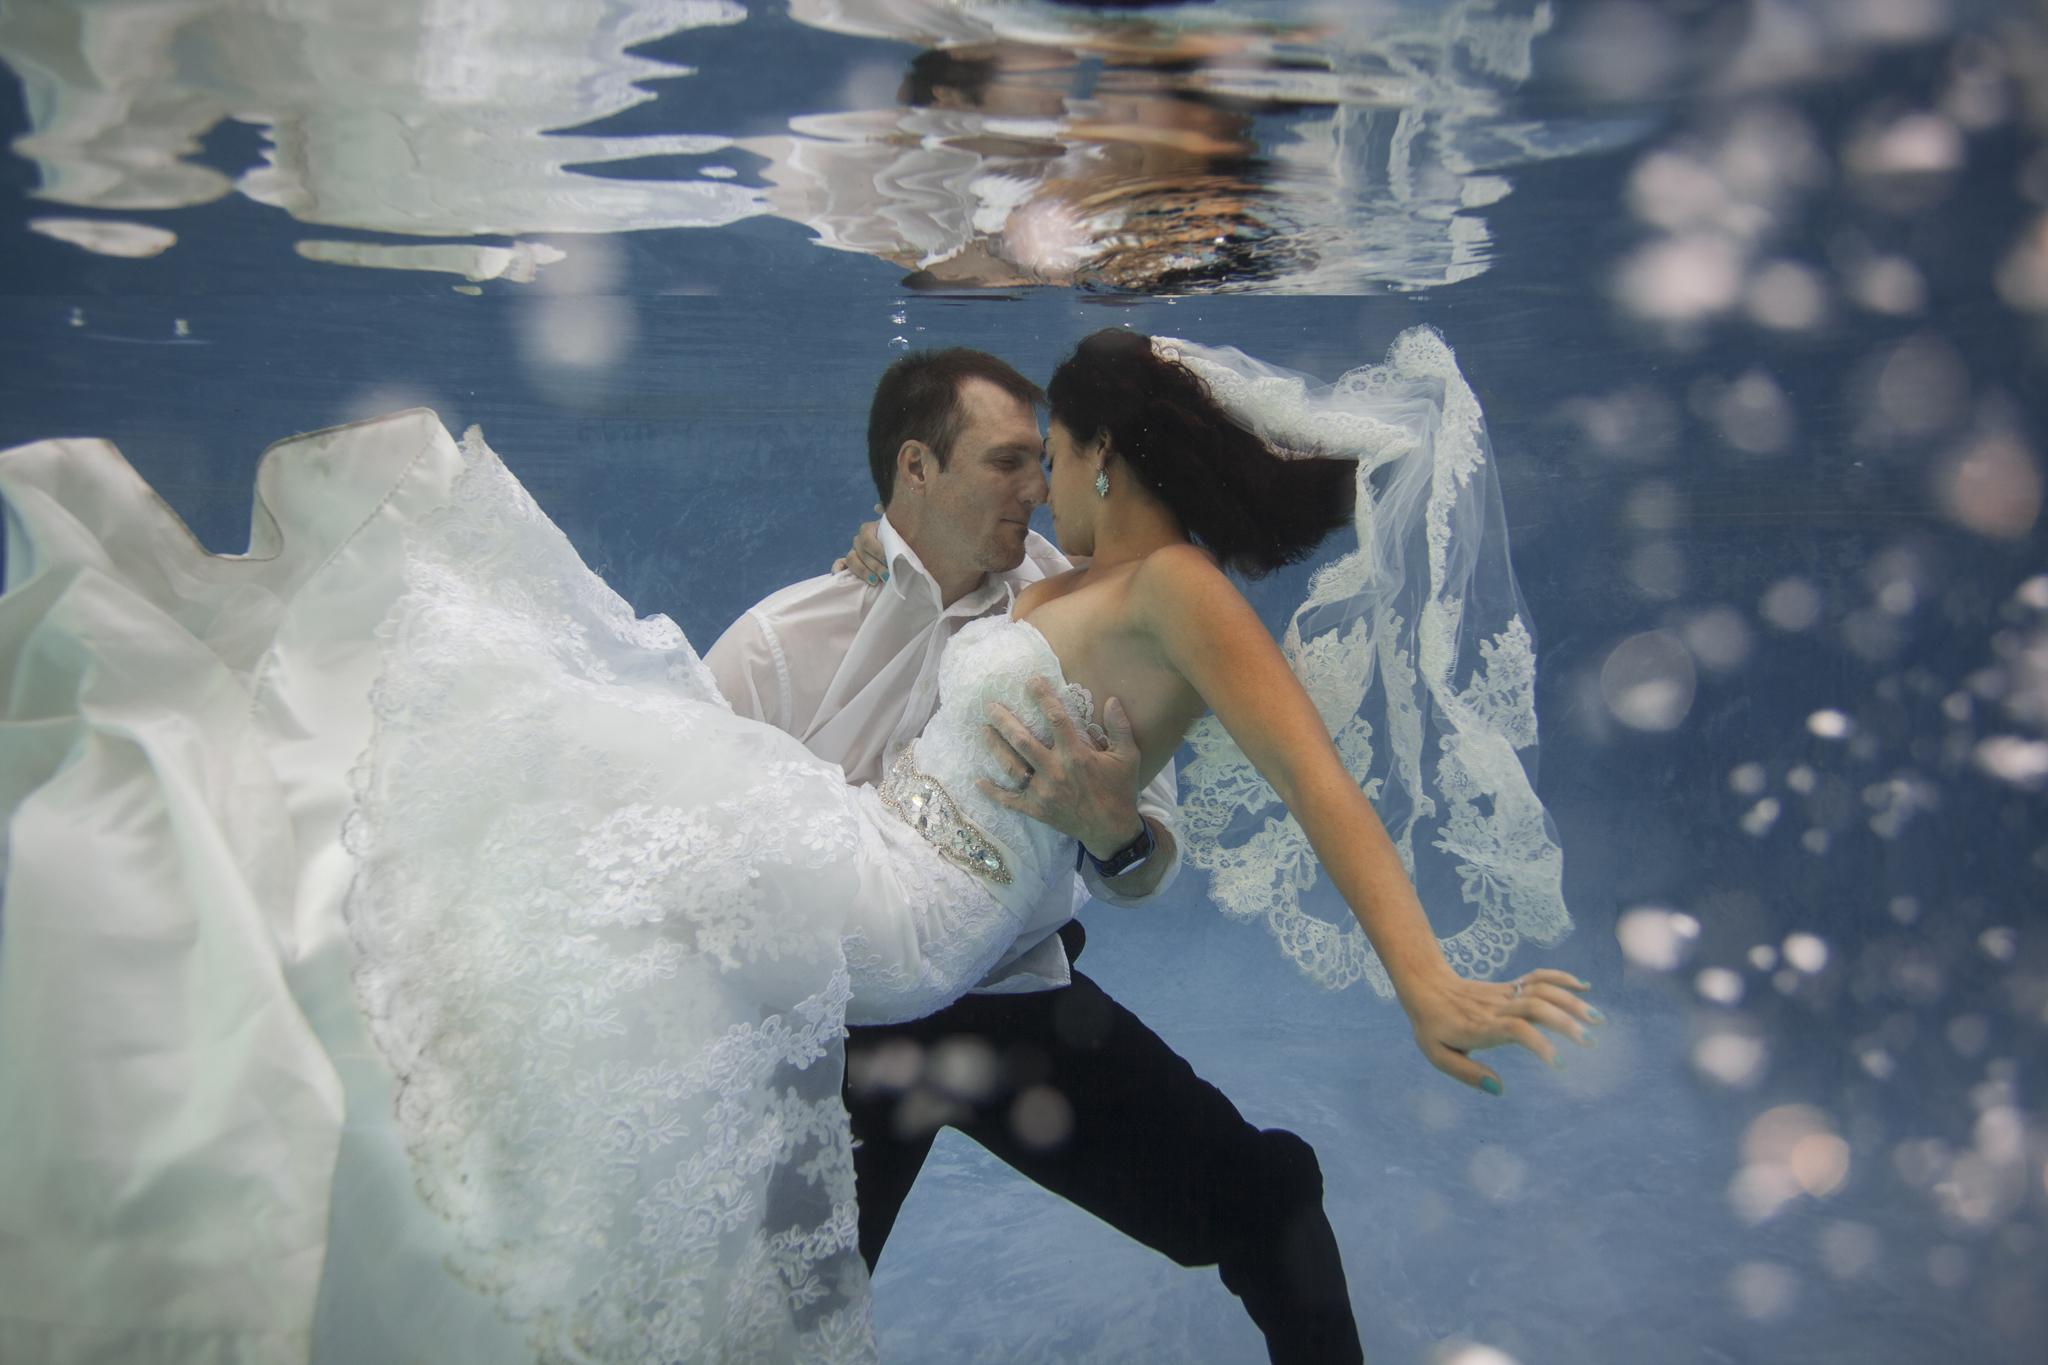 underwater wedding photos in a pool Phoenix AZ